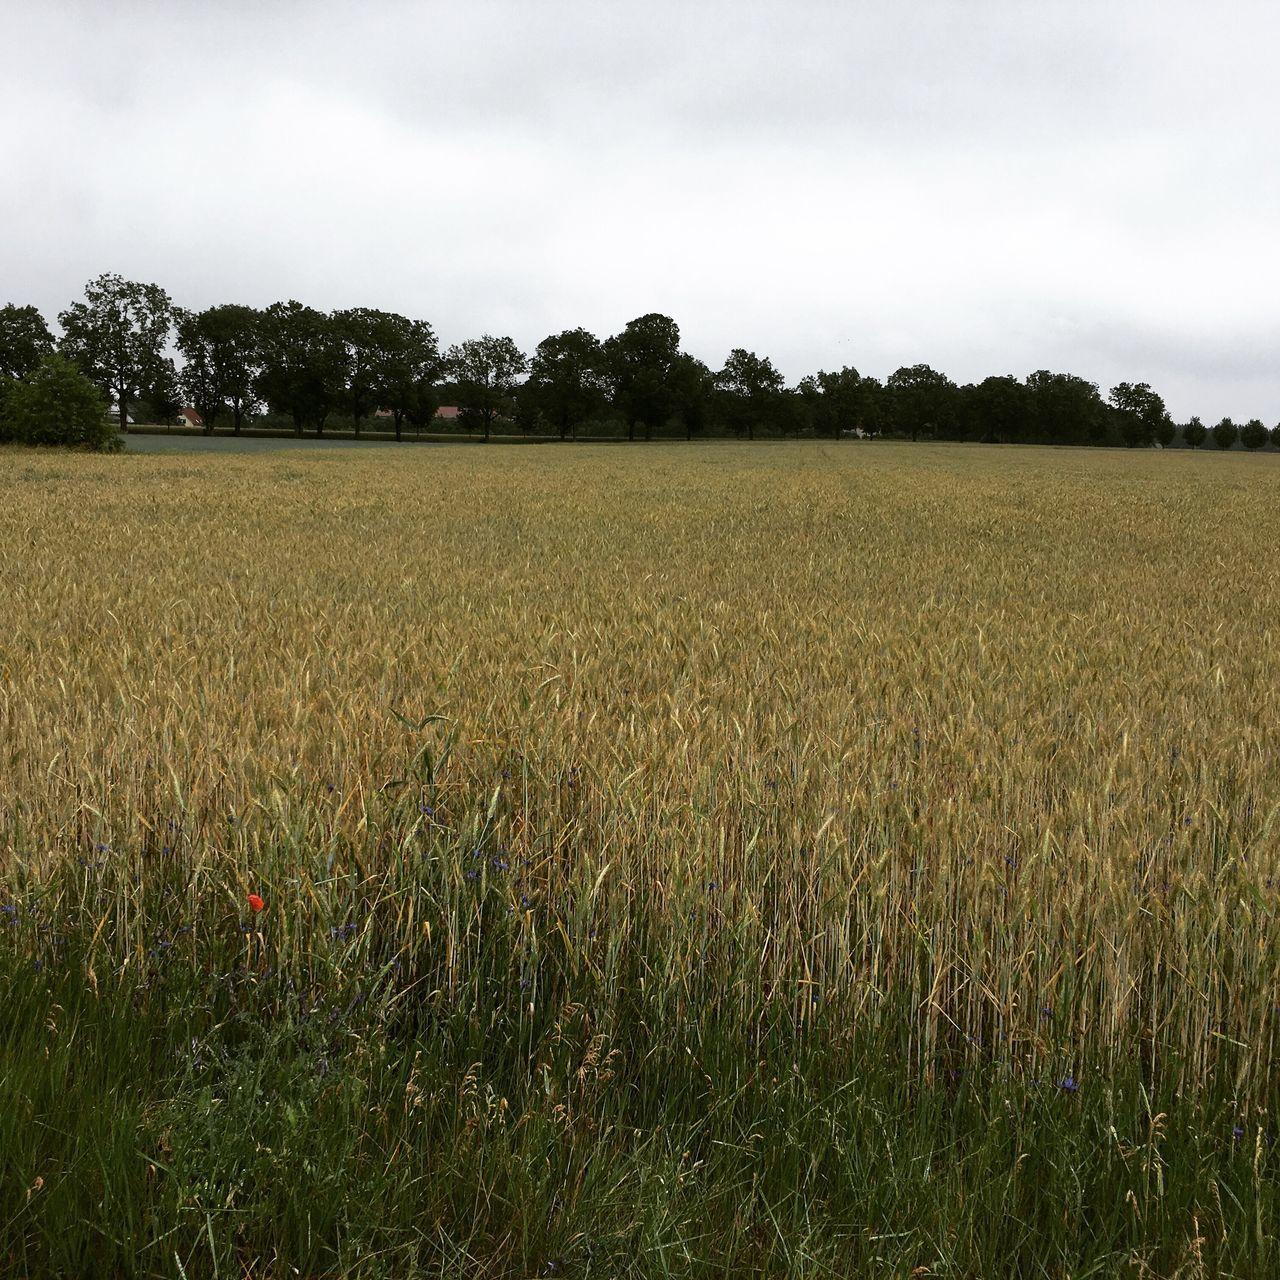 Corn Kornfeld Getreide Getreidefeld Mohnblume Cloudy Cloudy Day Cloudy Skies Summer Einbettimkornfeld Field Feld